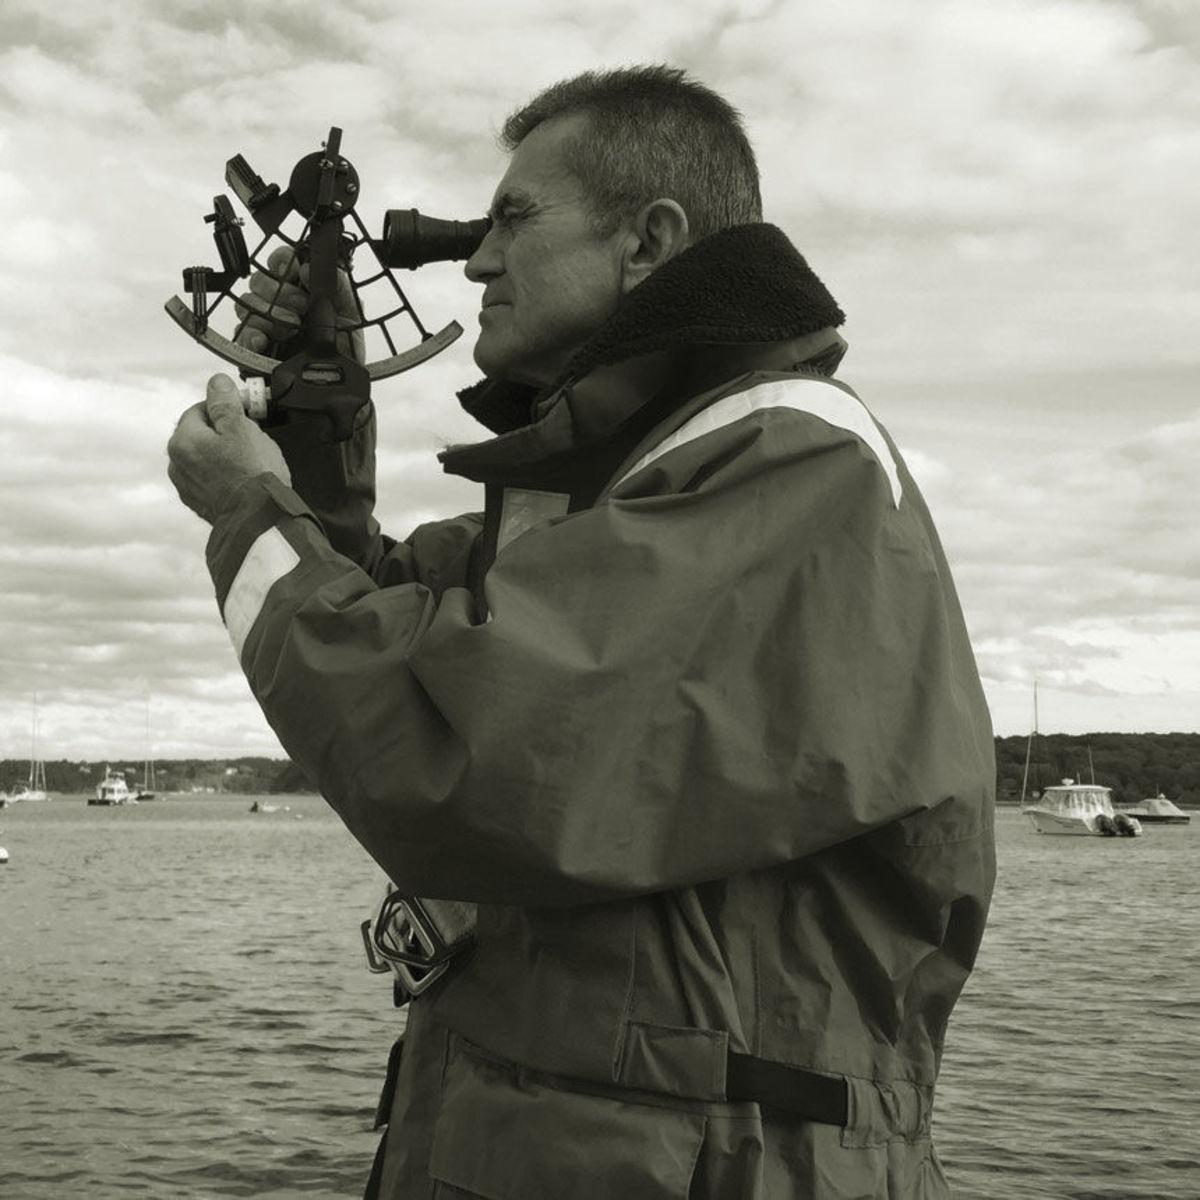 Istvan Kopar has a lifetime of sailing and marine industry experience.